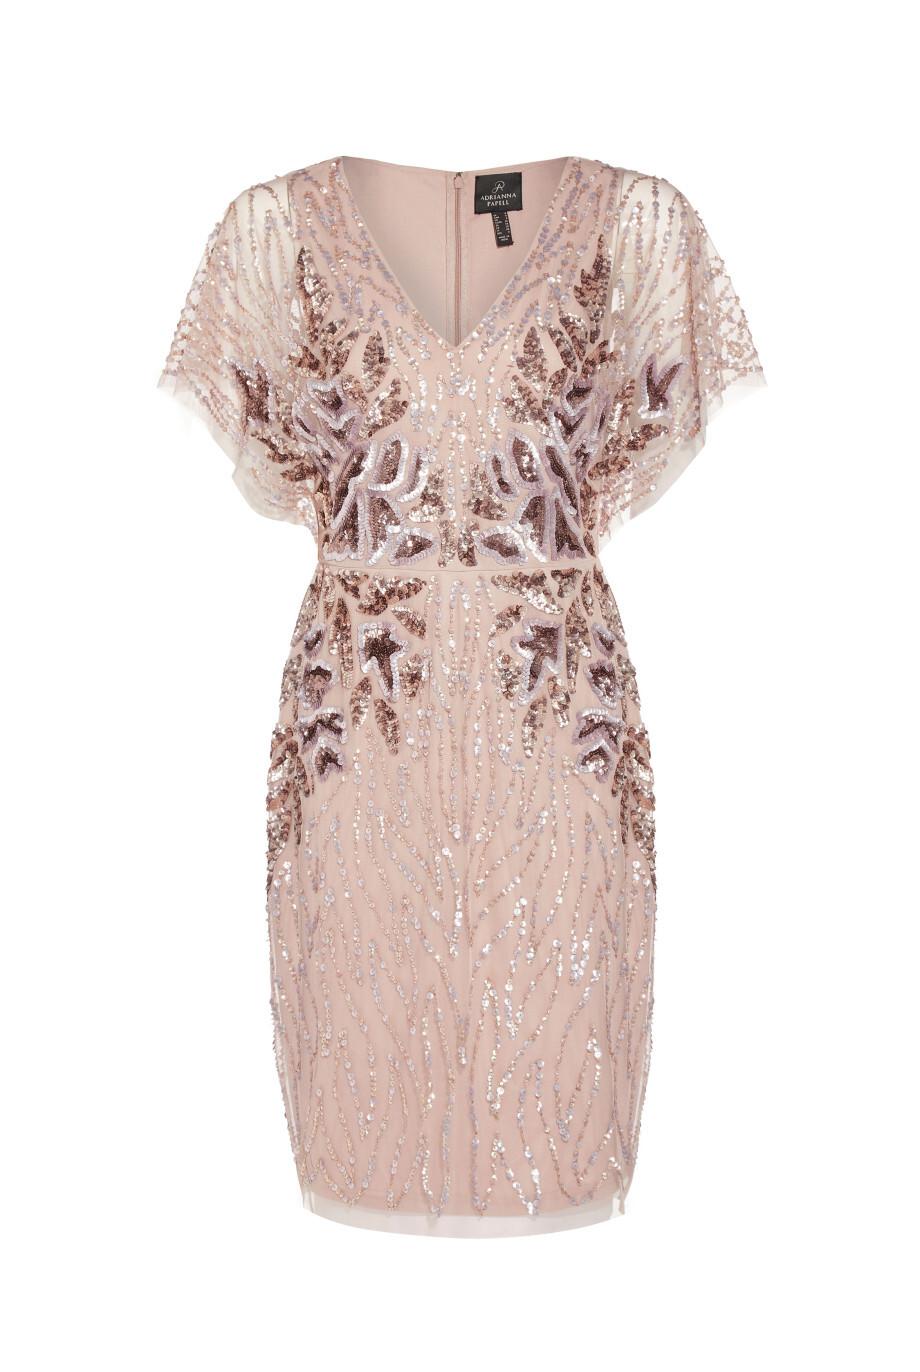 Short Beaded Dress,beaded dress,beaded dress,